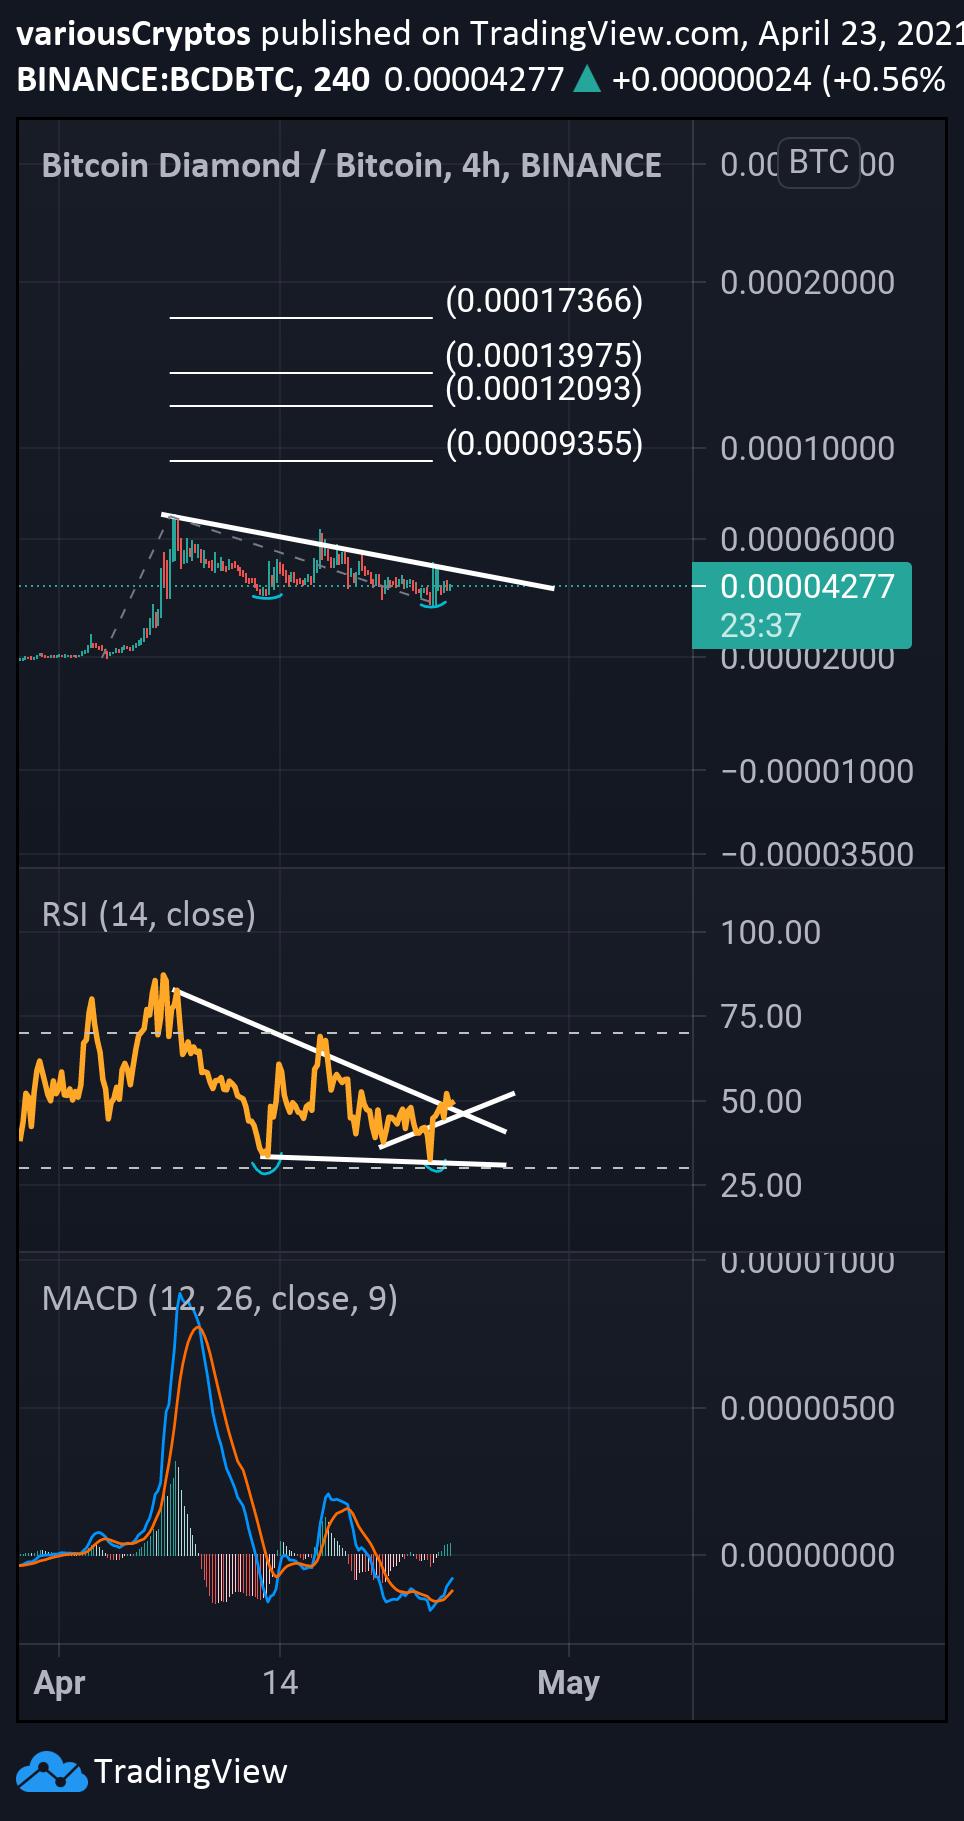 bcd btc tradingview